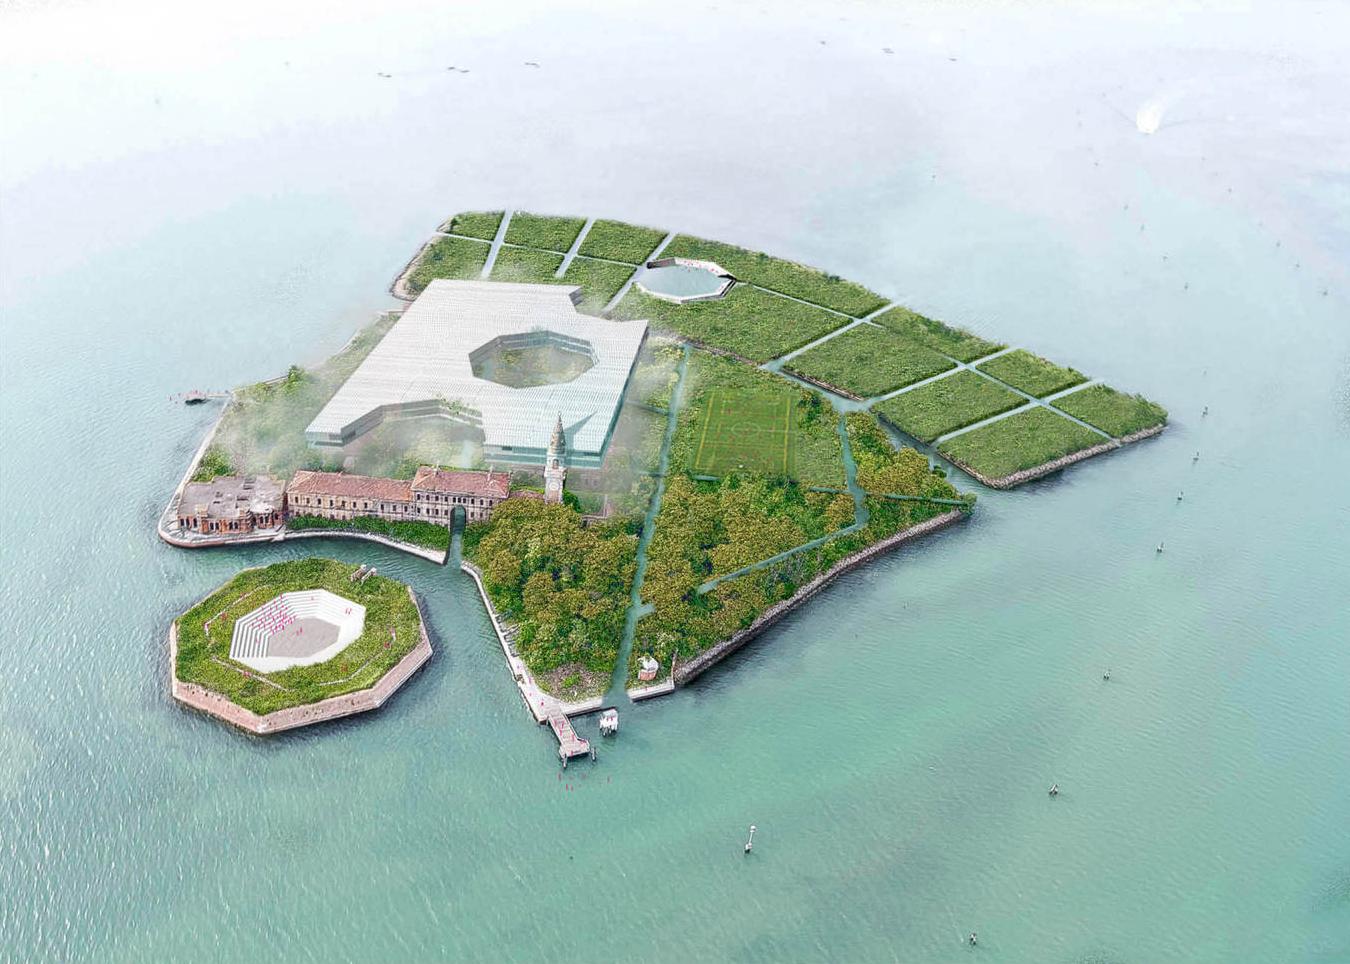 University Island